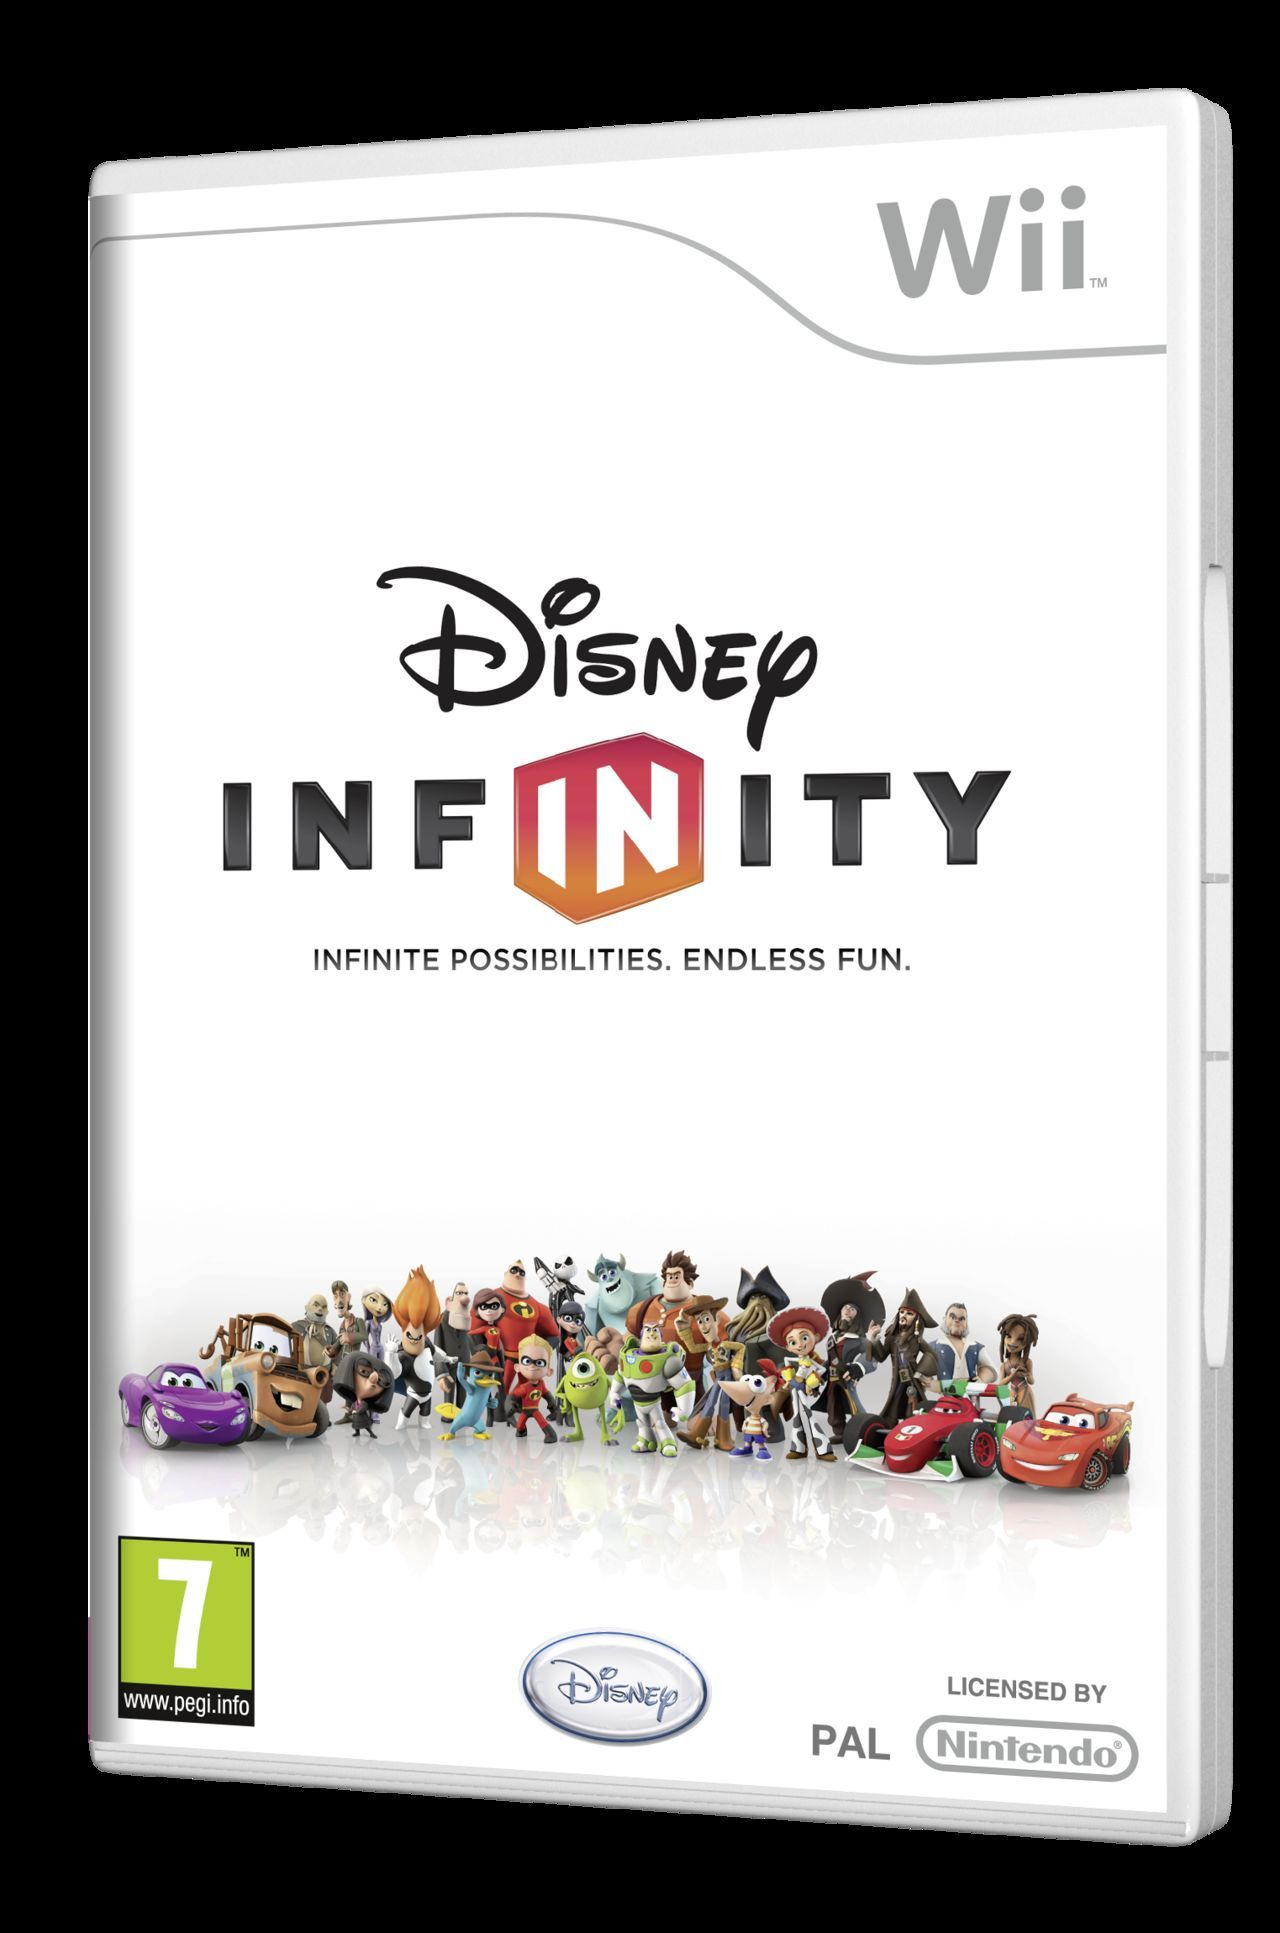 Disney Infinity [MULTI4][USA] Disney-infinity-2013817173740_1